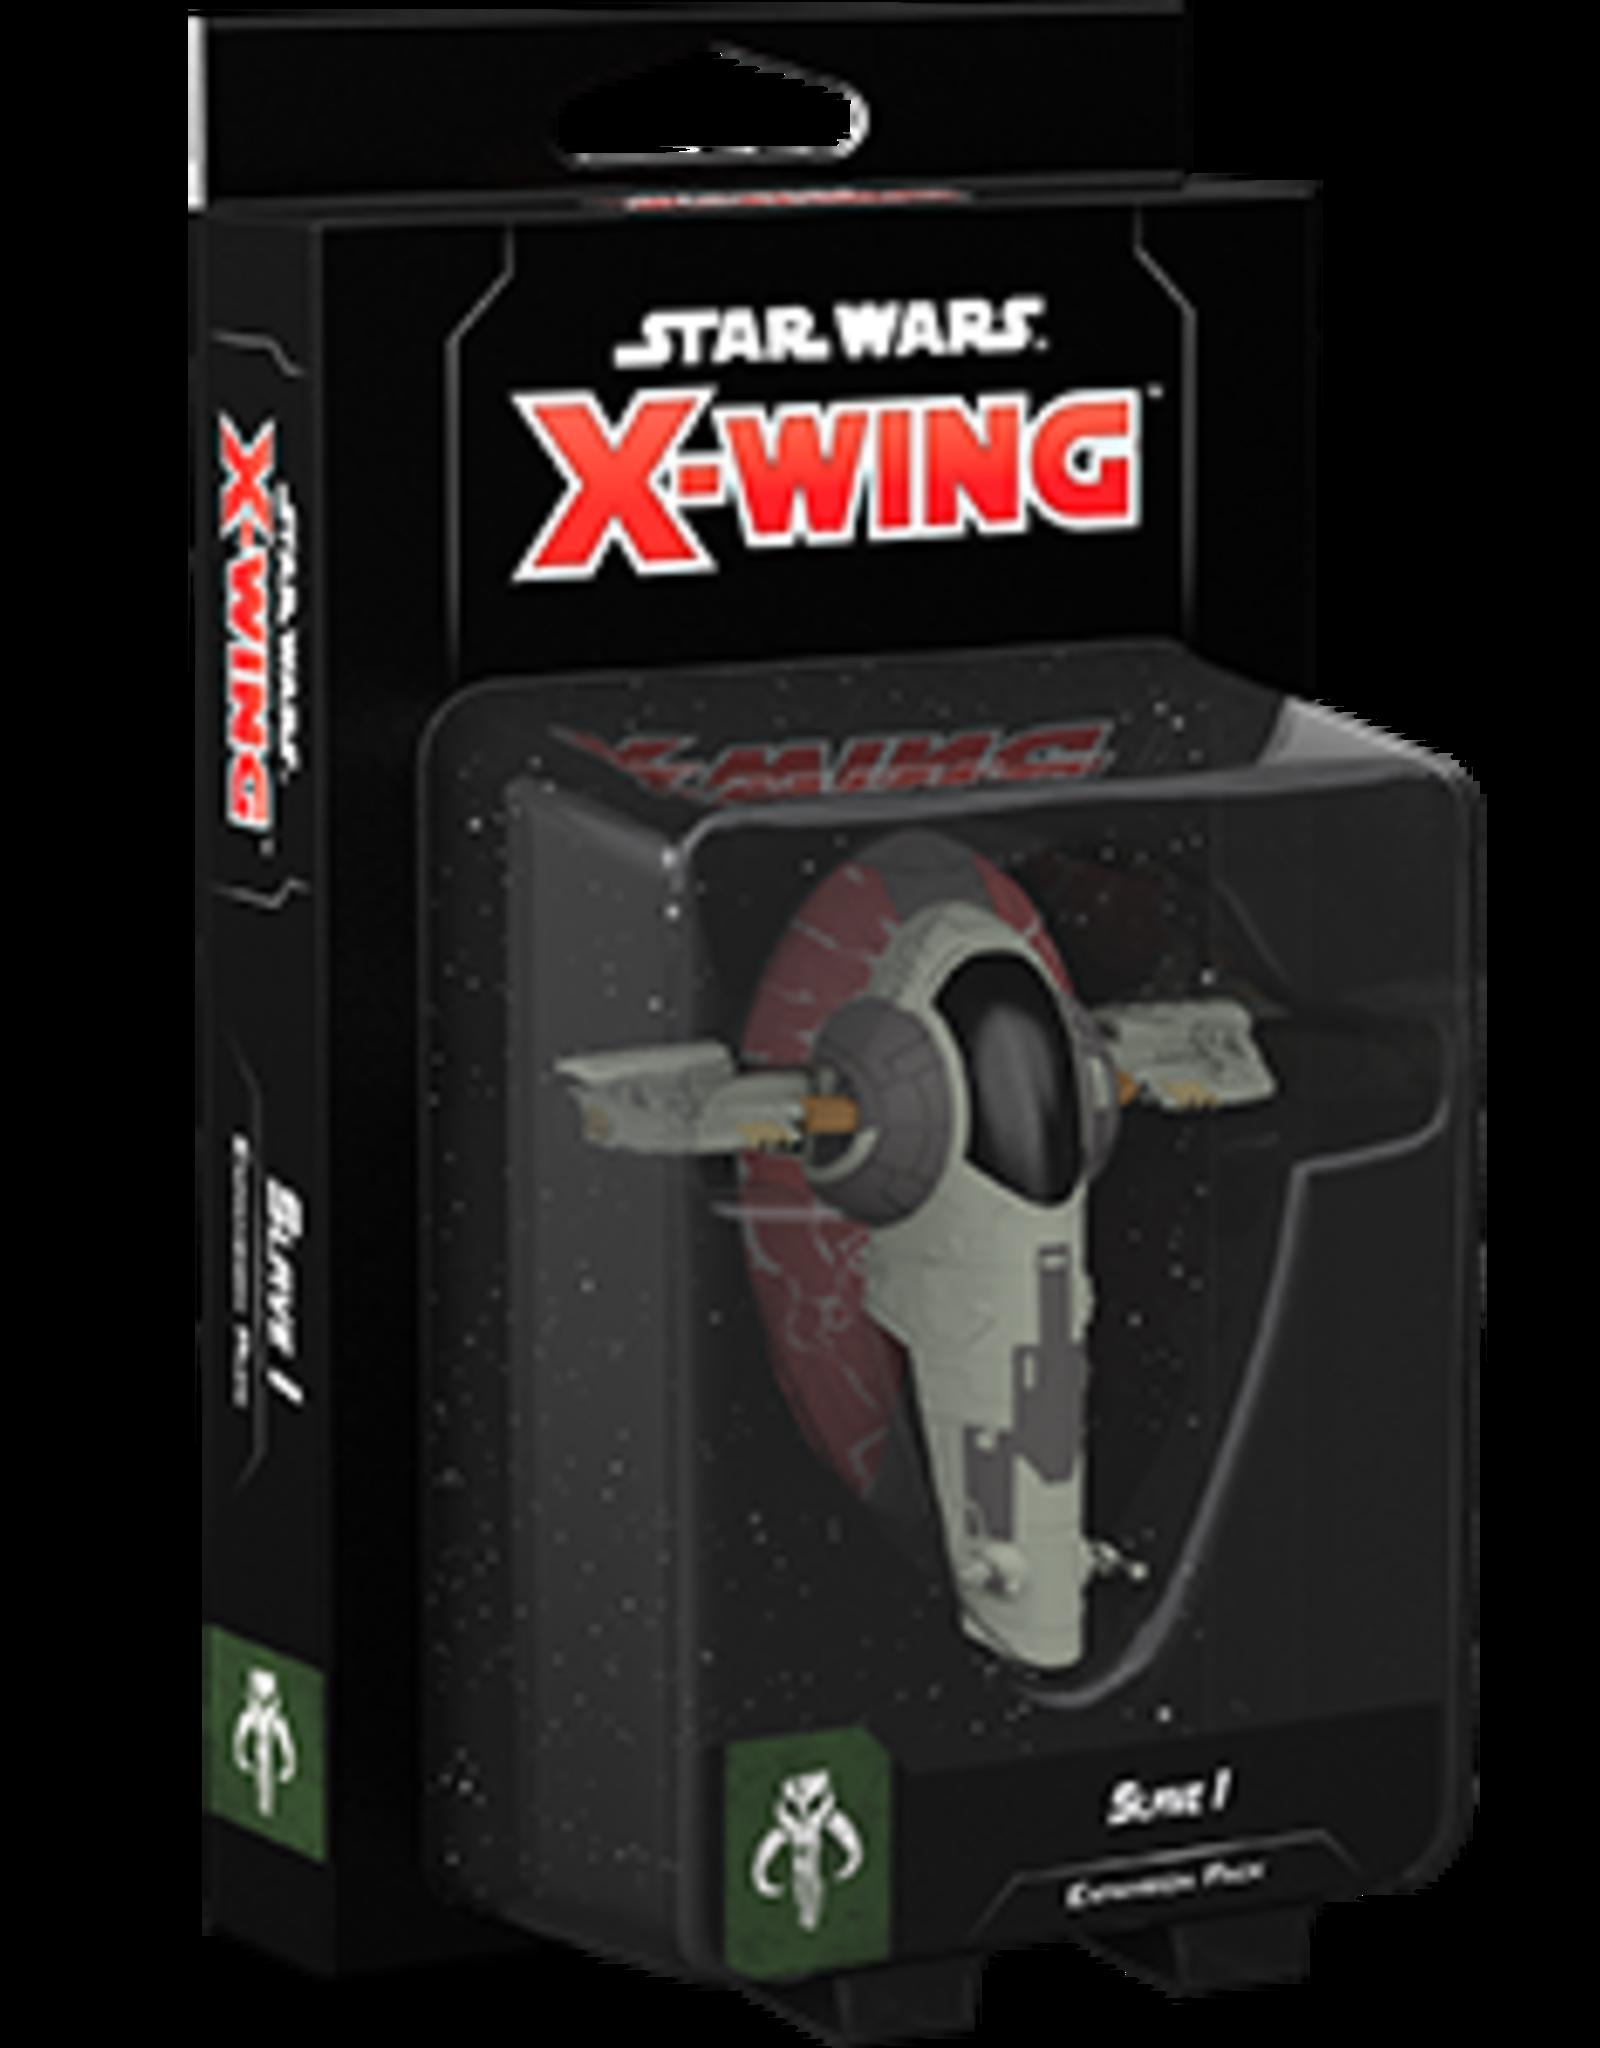 FFG Star Wars X-Wing 2.0: Slave 1 Expansion Pack